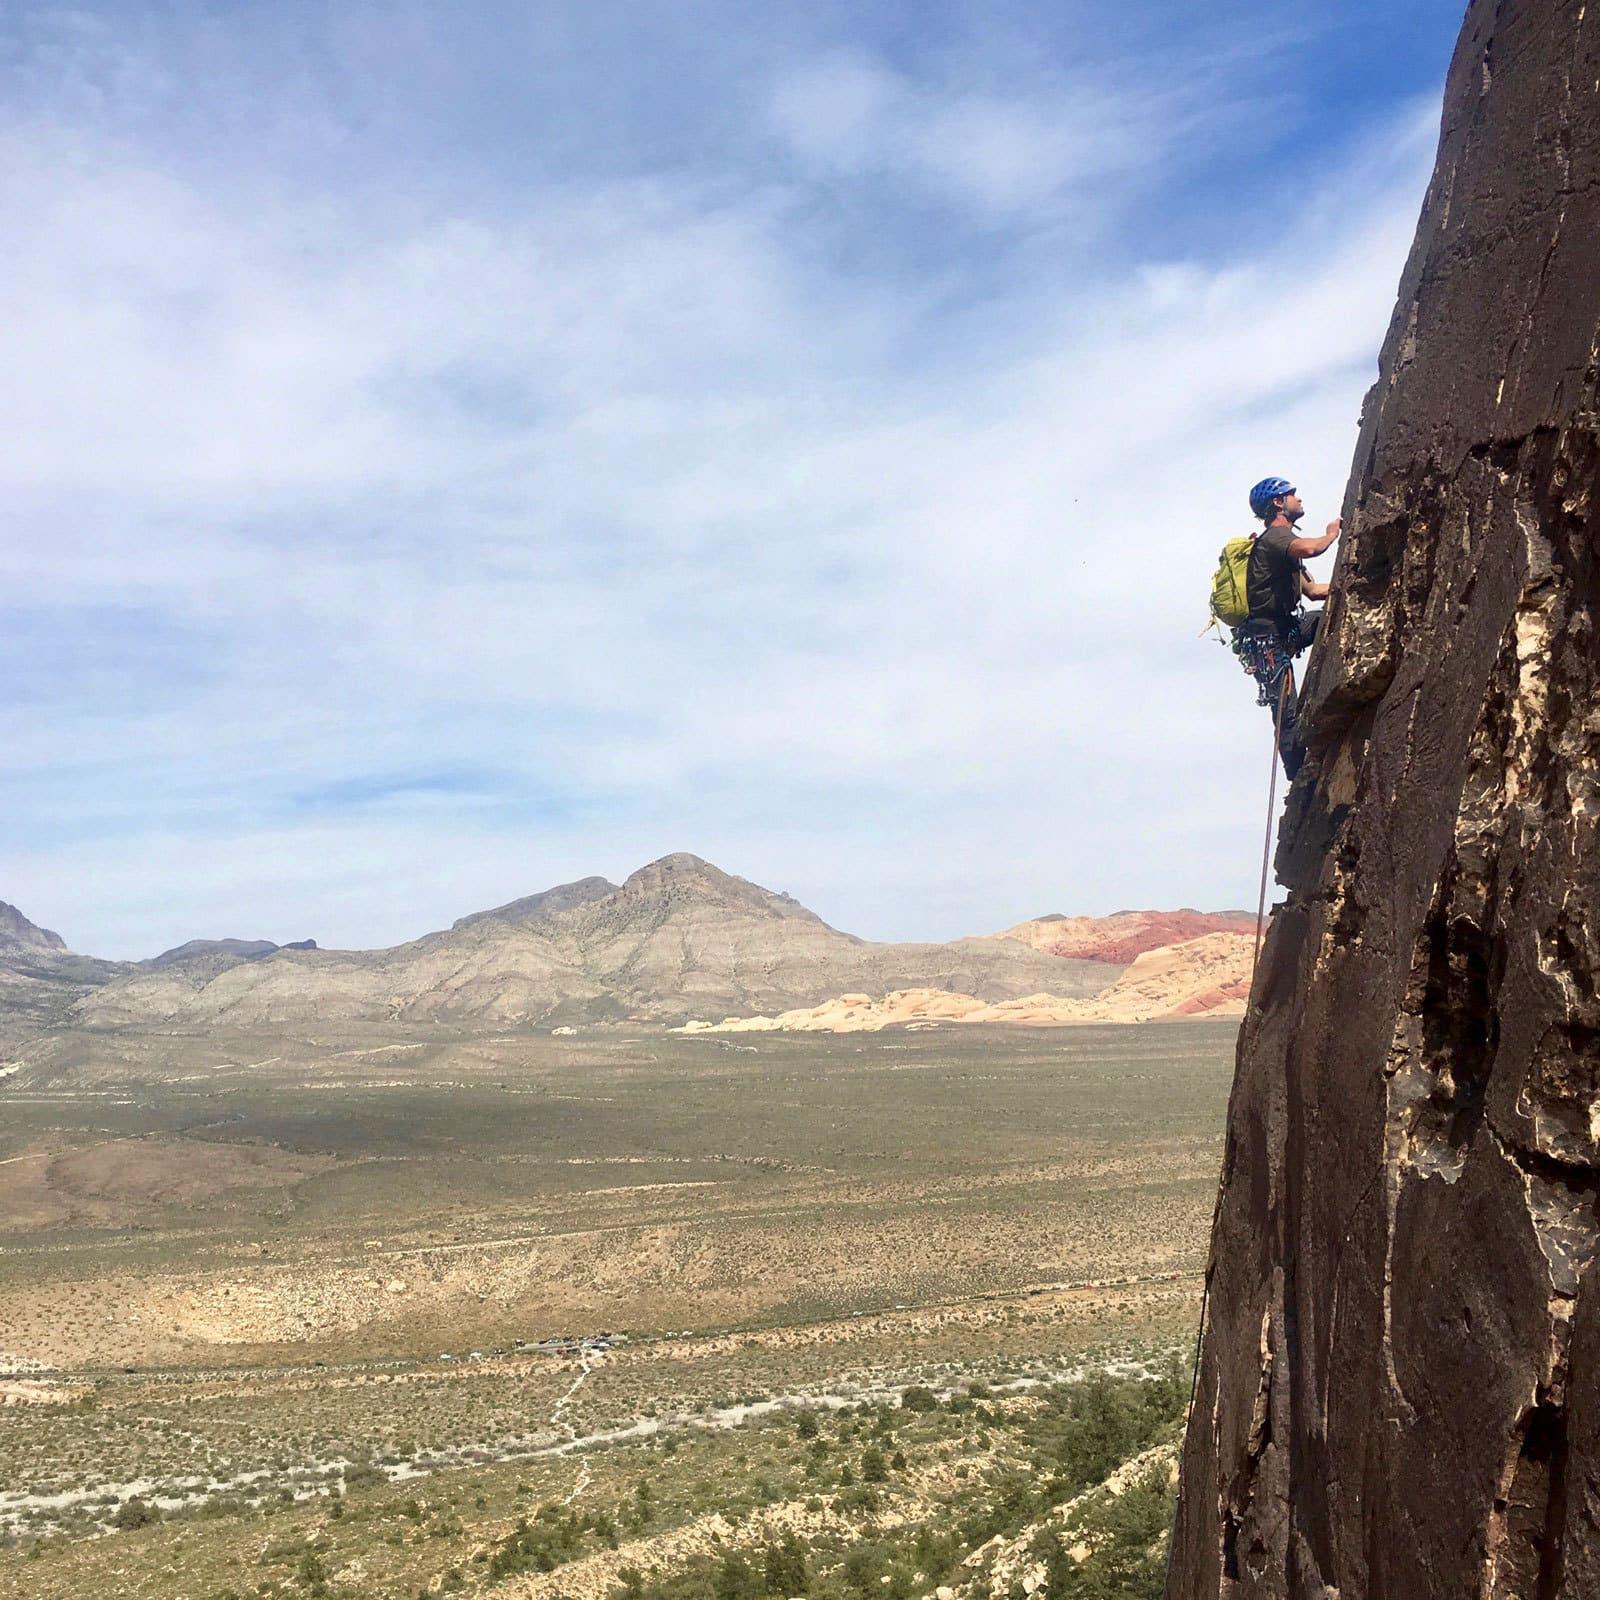 Red Rocks 8 Day Rock Climbing Camp: October 14-21, 2018